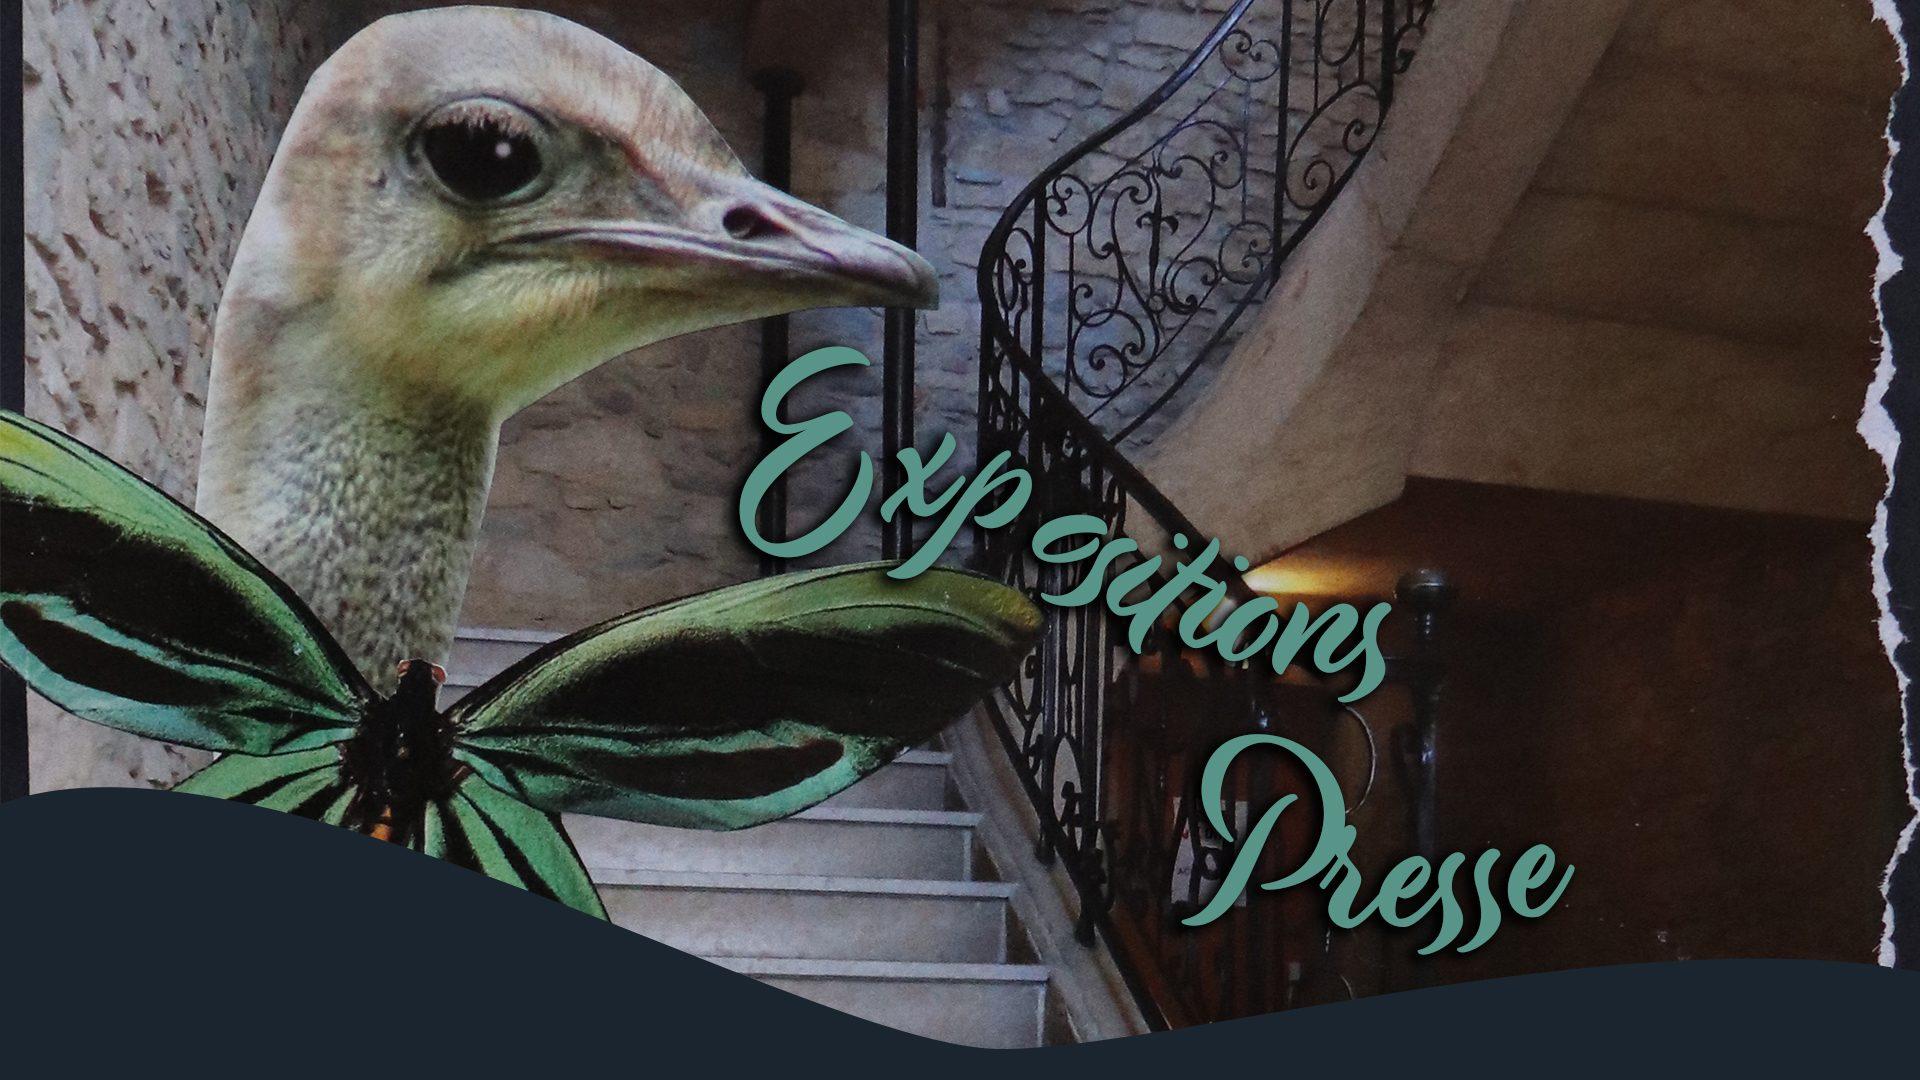 EXPOSITION_PRESSE (1)